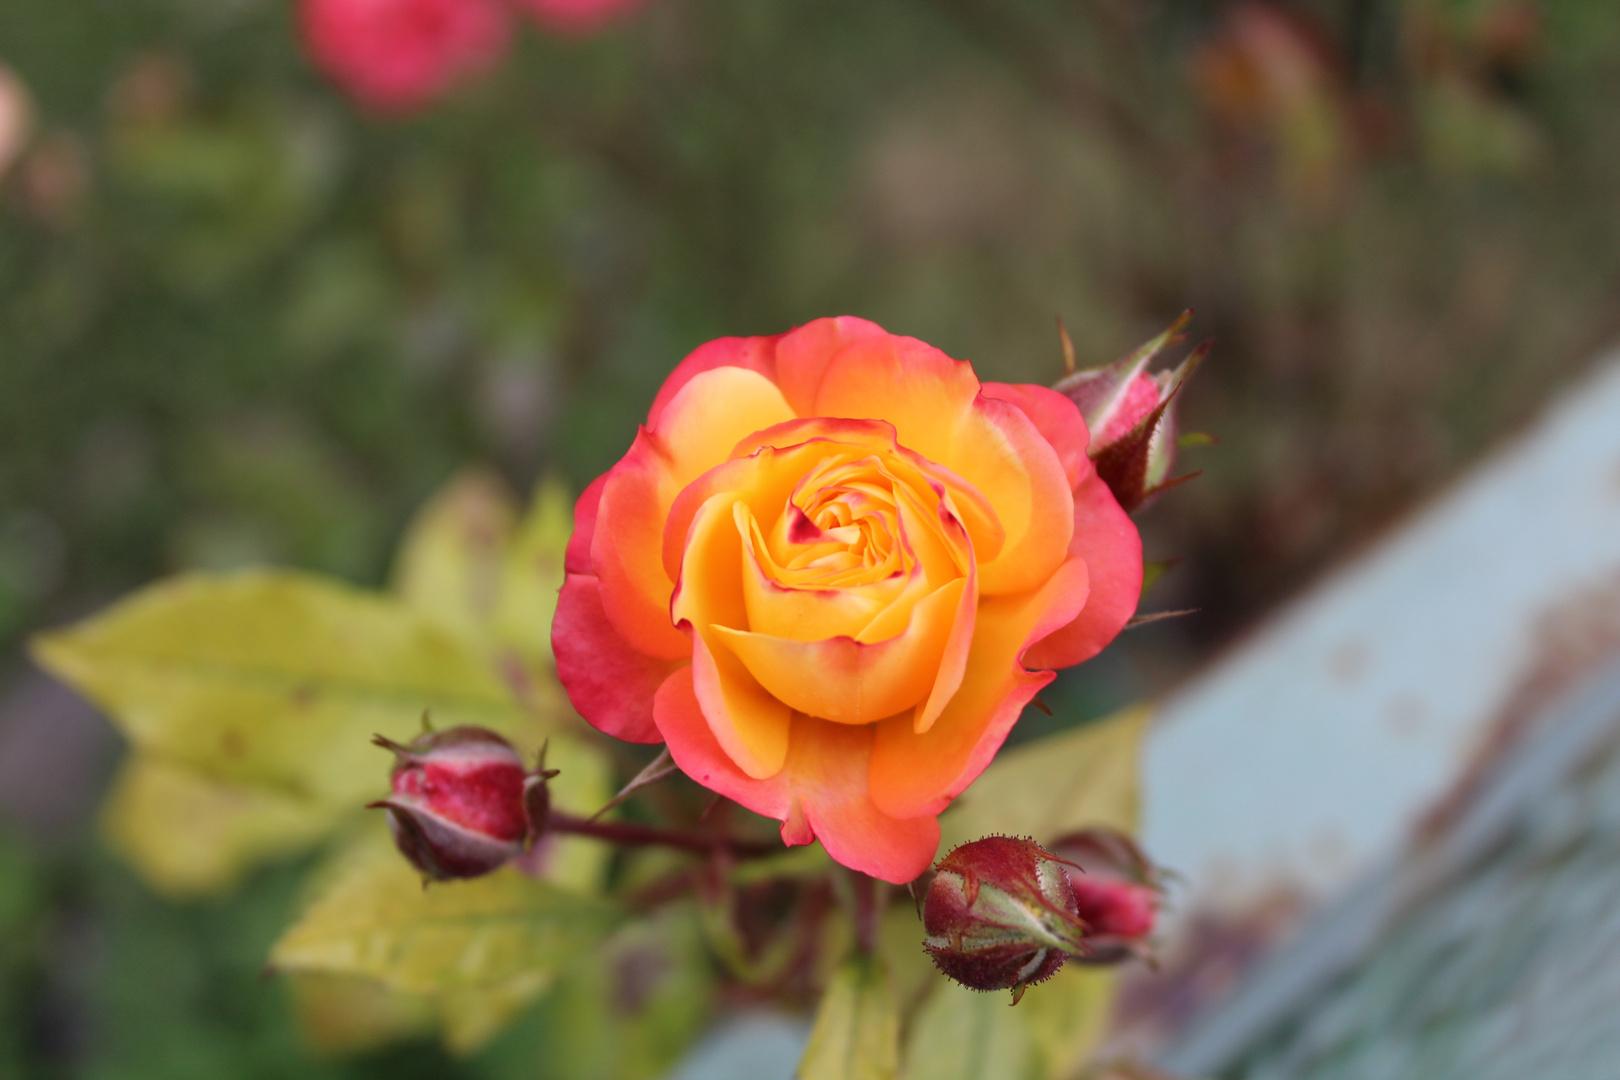 orangerote rose foto bild pflanzen pilze flechten bl ten kleinpflanzen rosen bilder. Black Bedroom Furniture Sets. Home Design Ideas